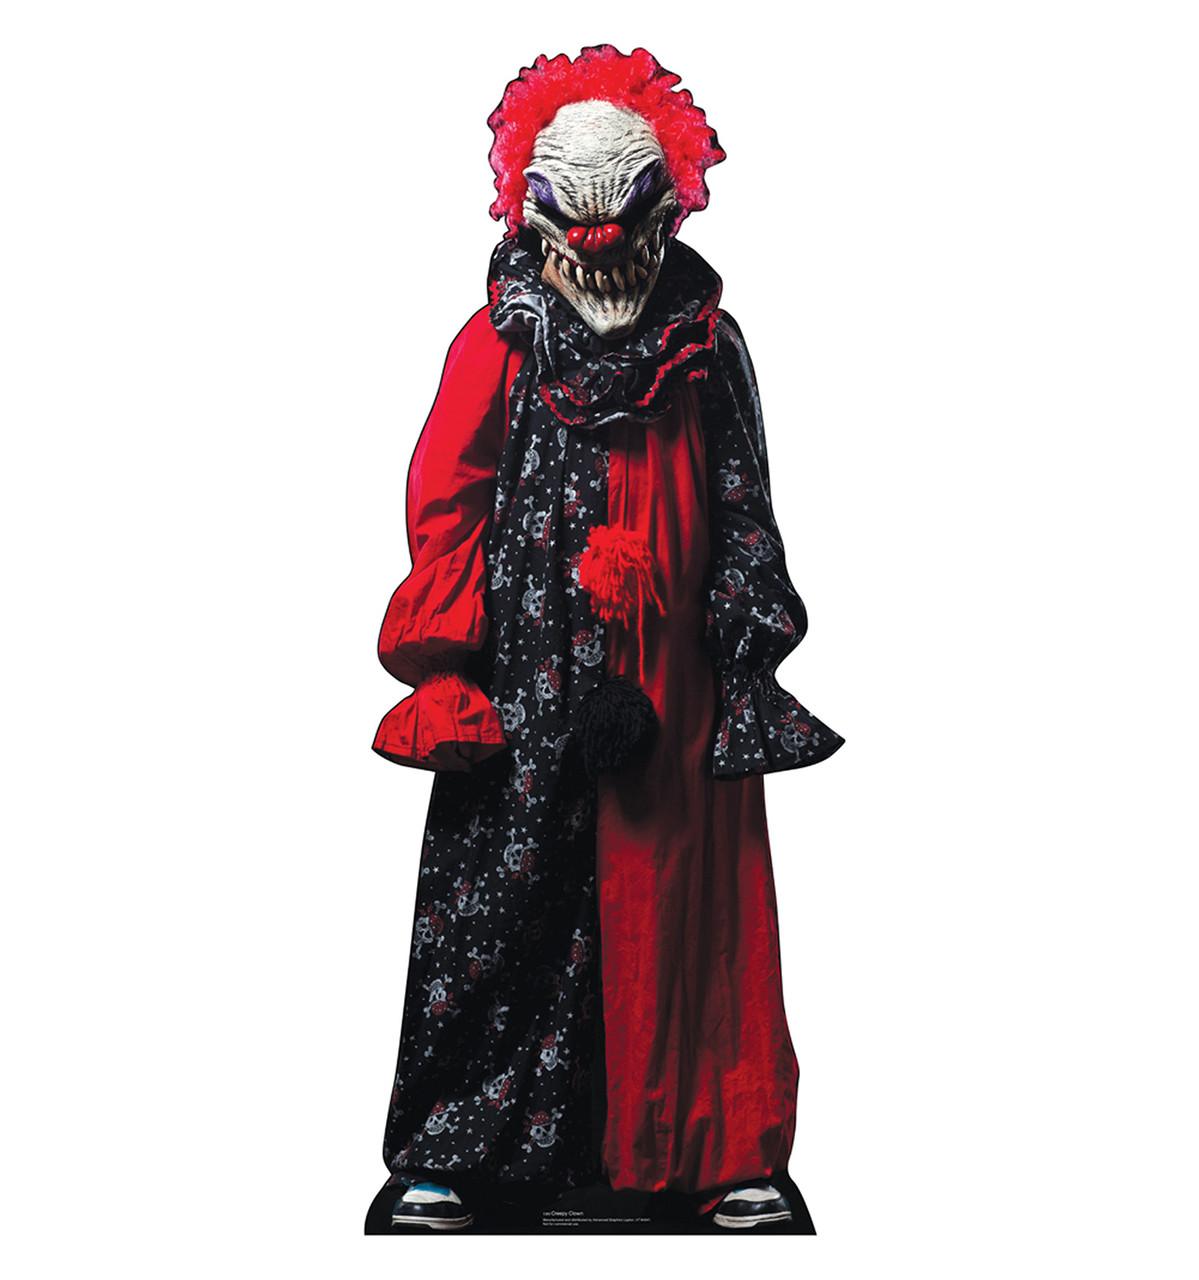 Life-size Creepy Clown Cardboard Standup